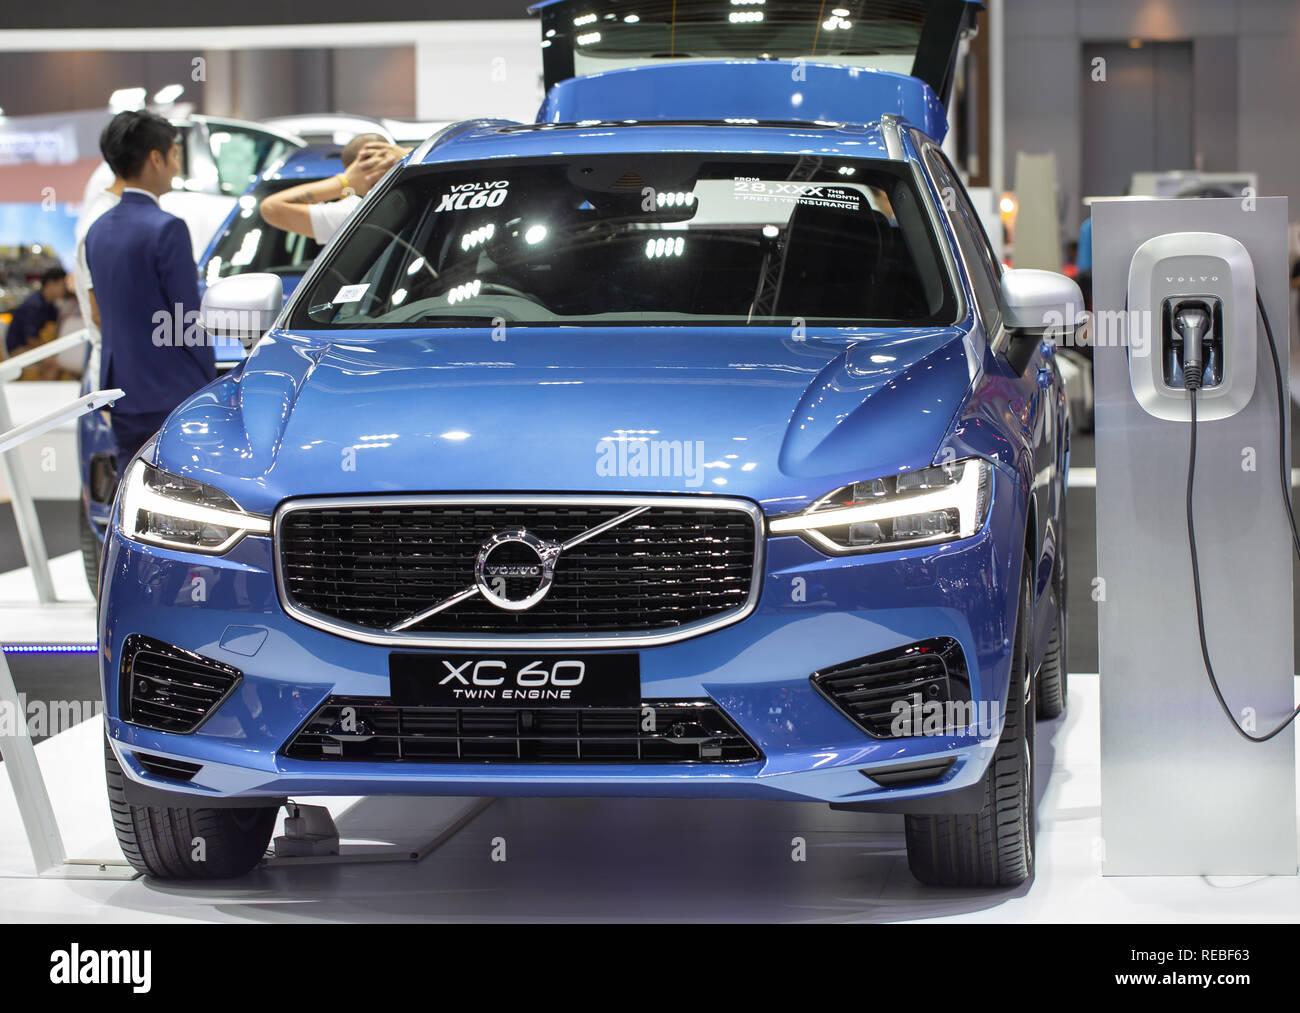 Nonthaburi, Thailand - December 4, 2018: Volvo XC 60 Twin Engine Hybrid SUV presented in Motor Expo 2018 - Stock Image